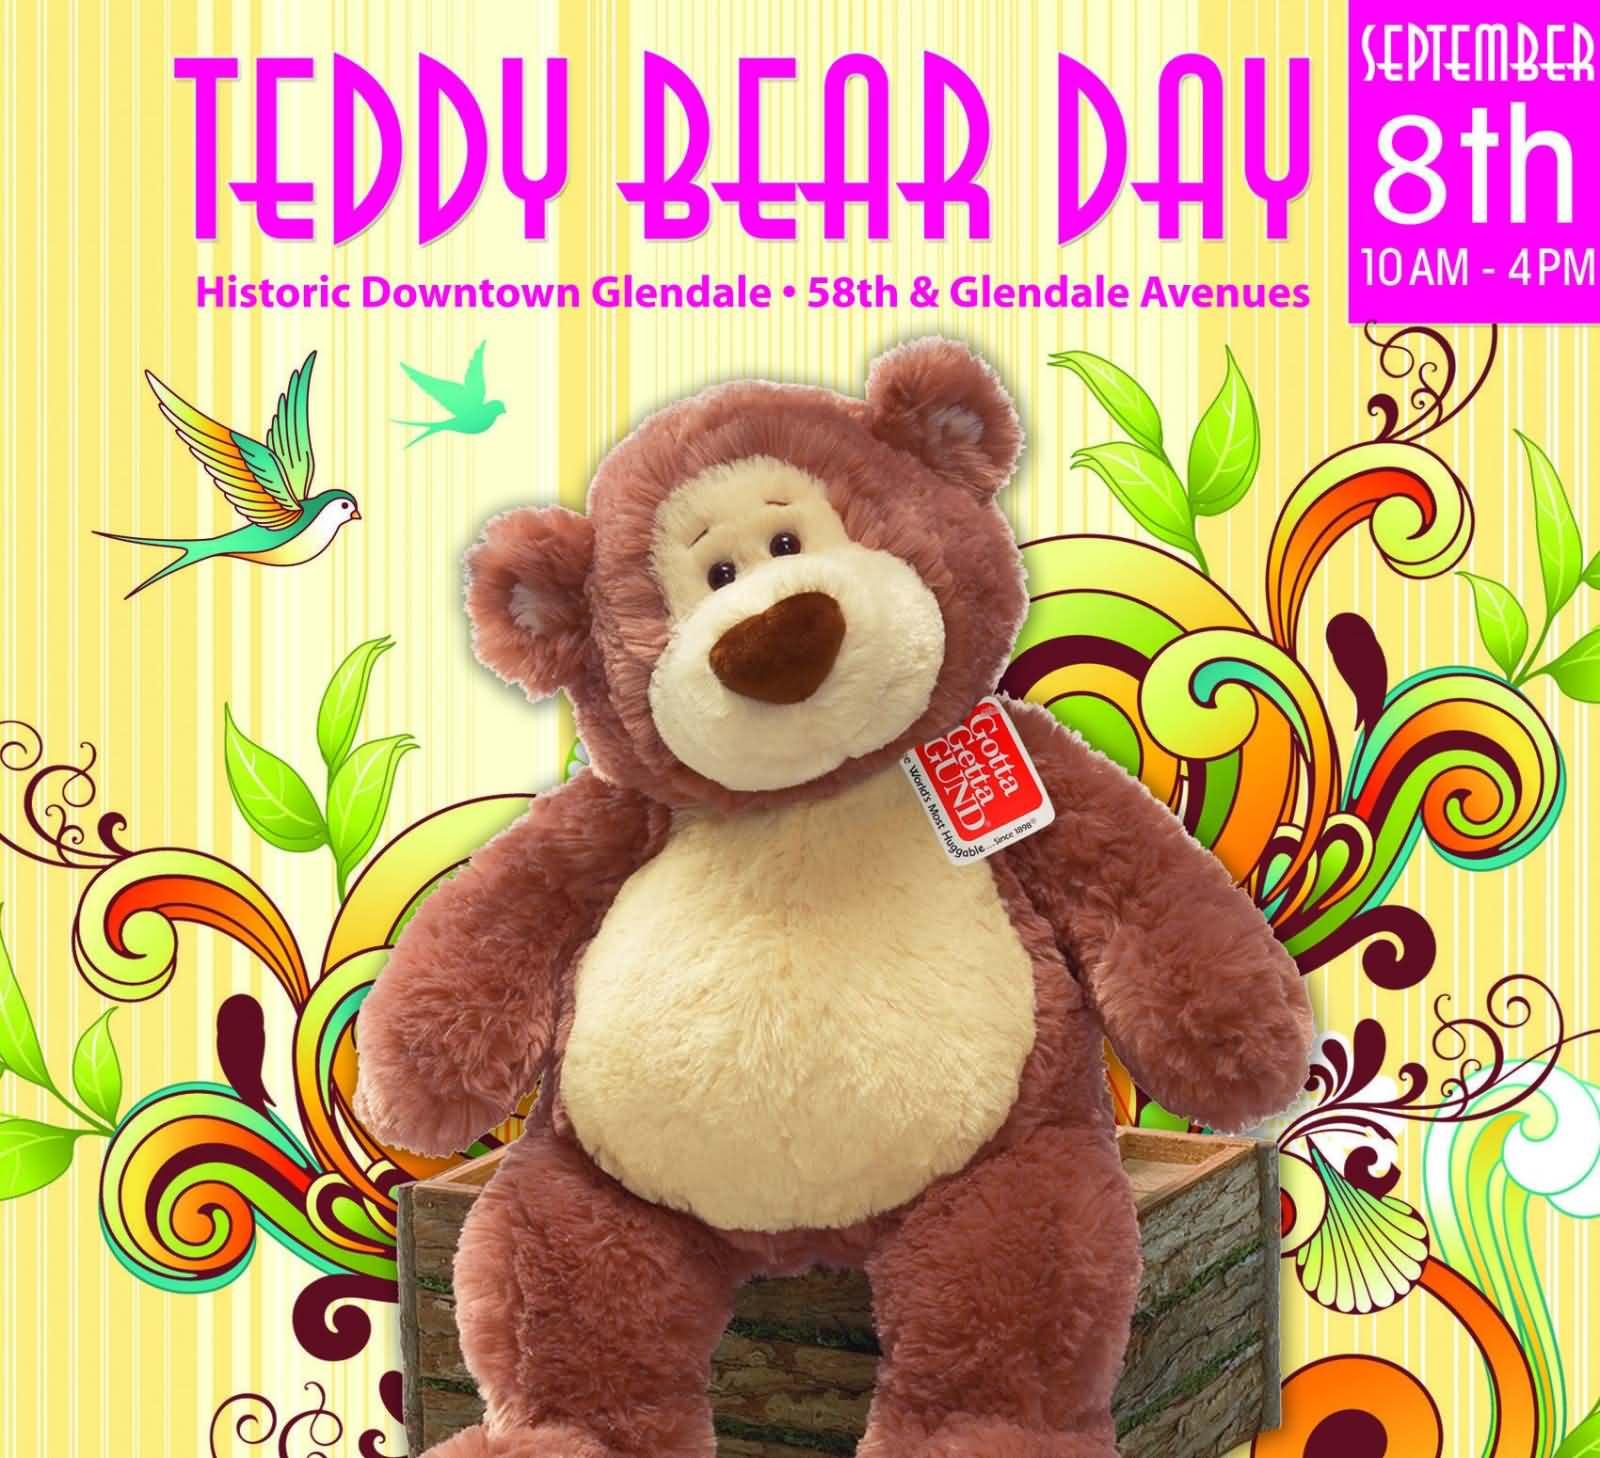 Teddy Bear Day September 8th